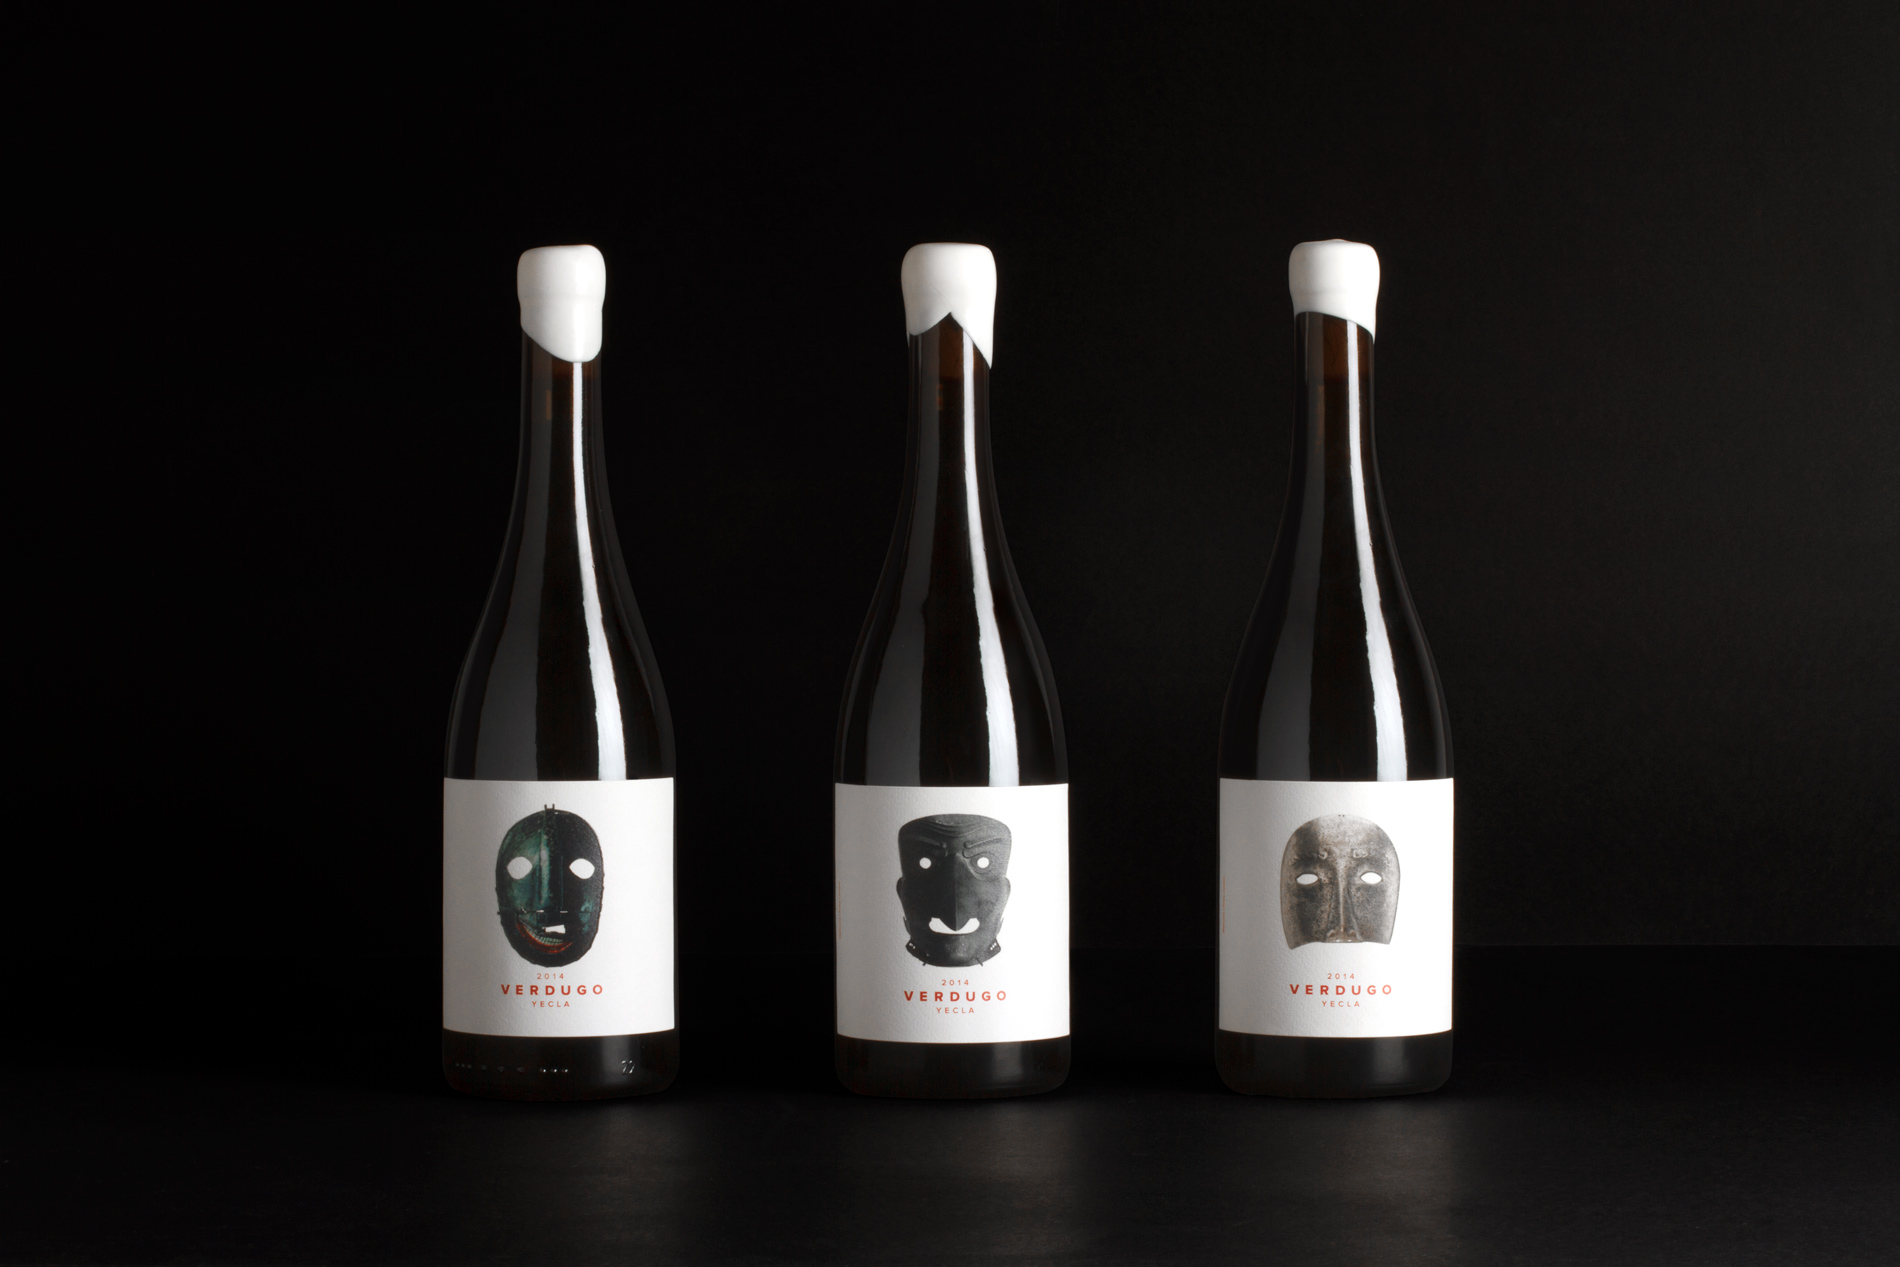 Wine-Verdugo-Norestestudio